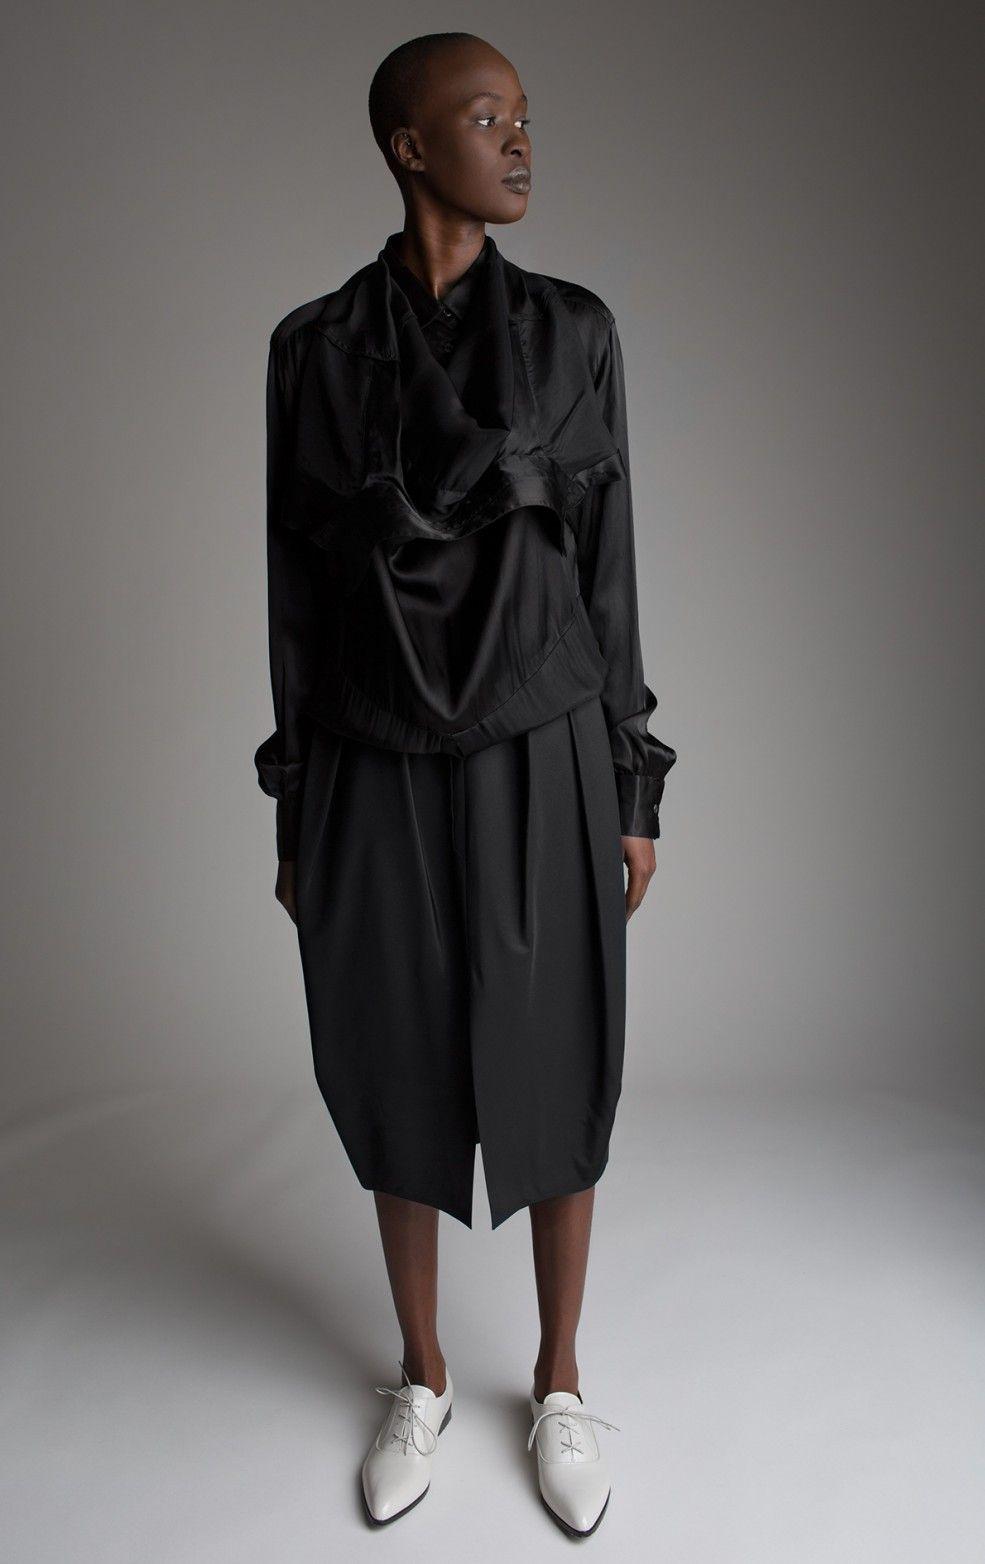 Jean Collona Double Shirt Dress Koos van den Akker Skirt Designer Vintage Fashion